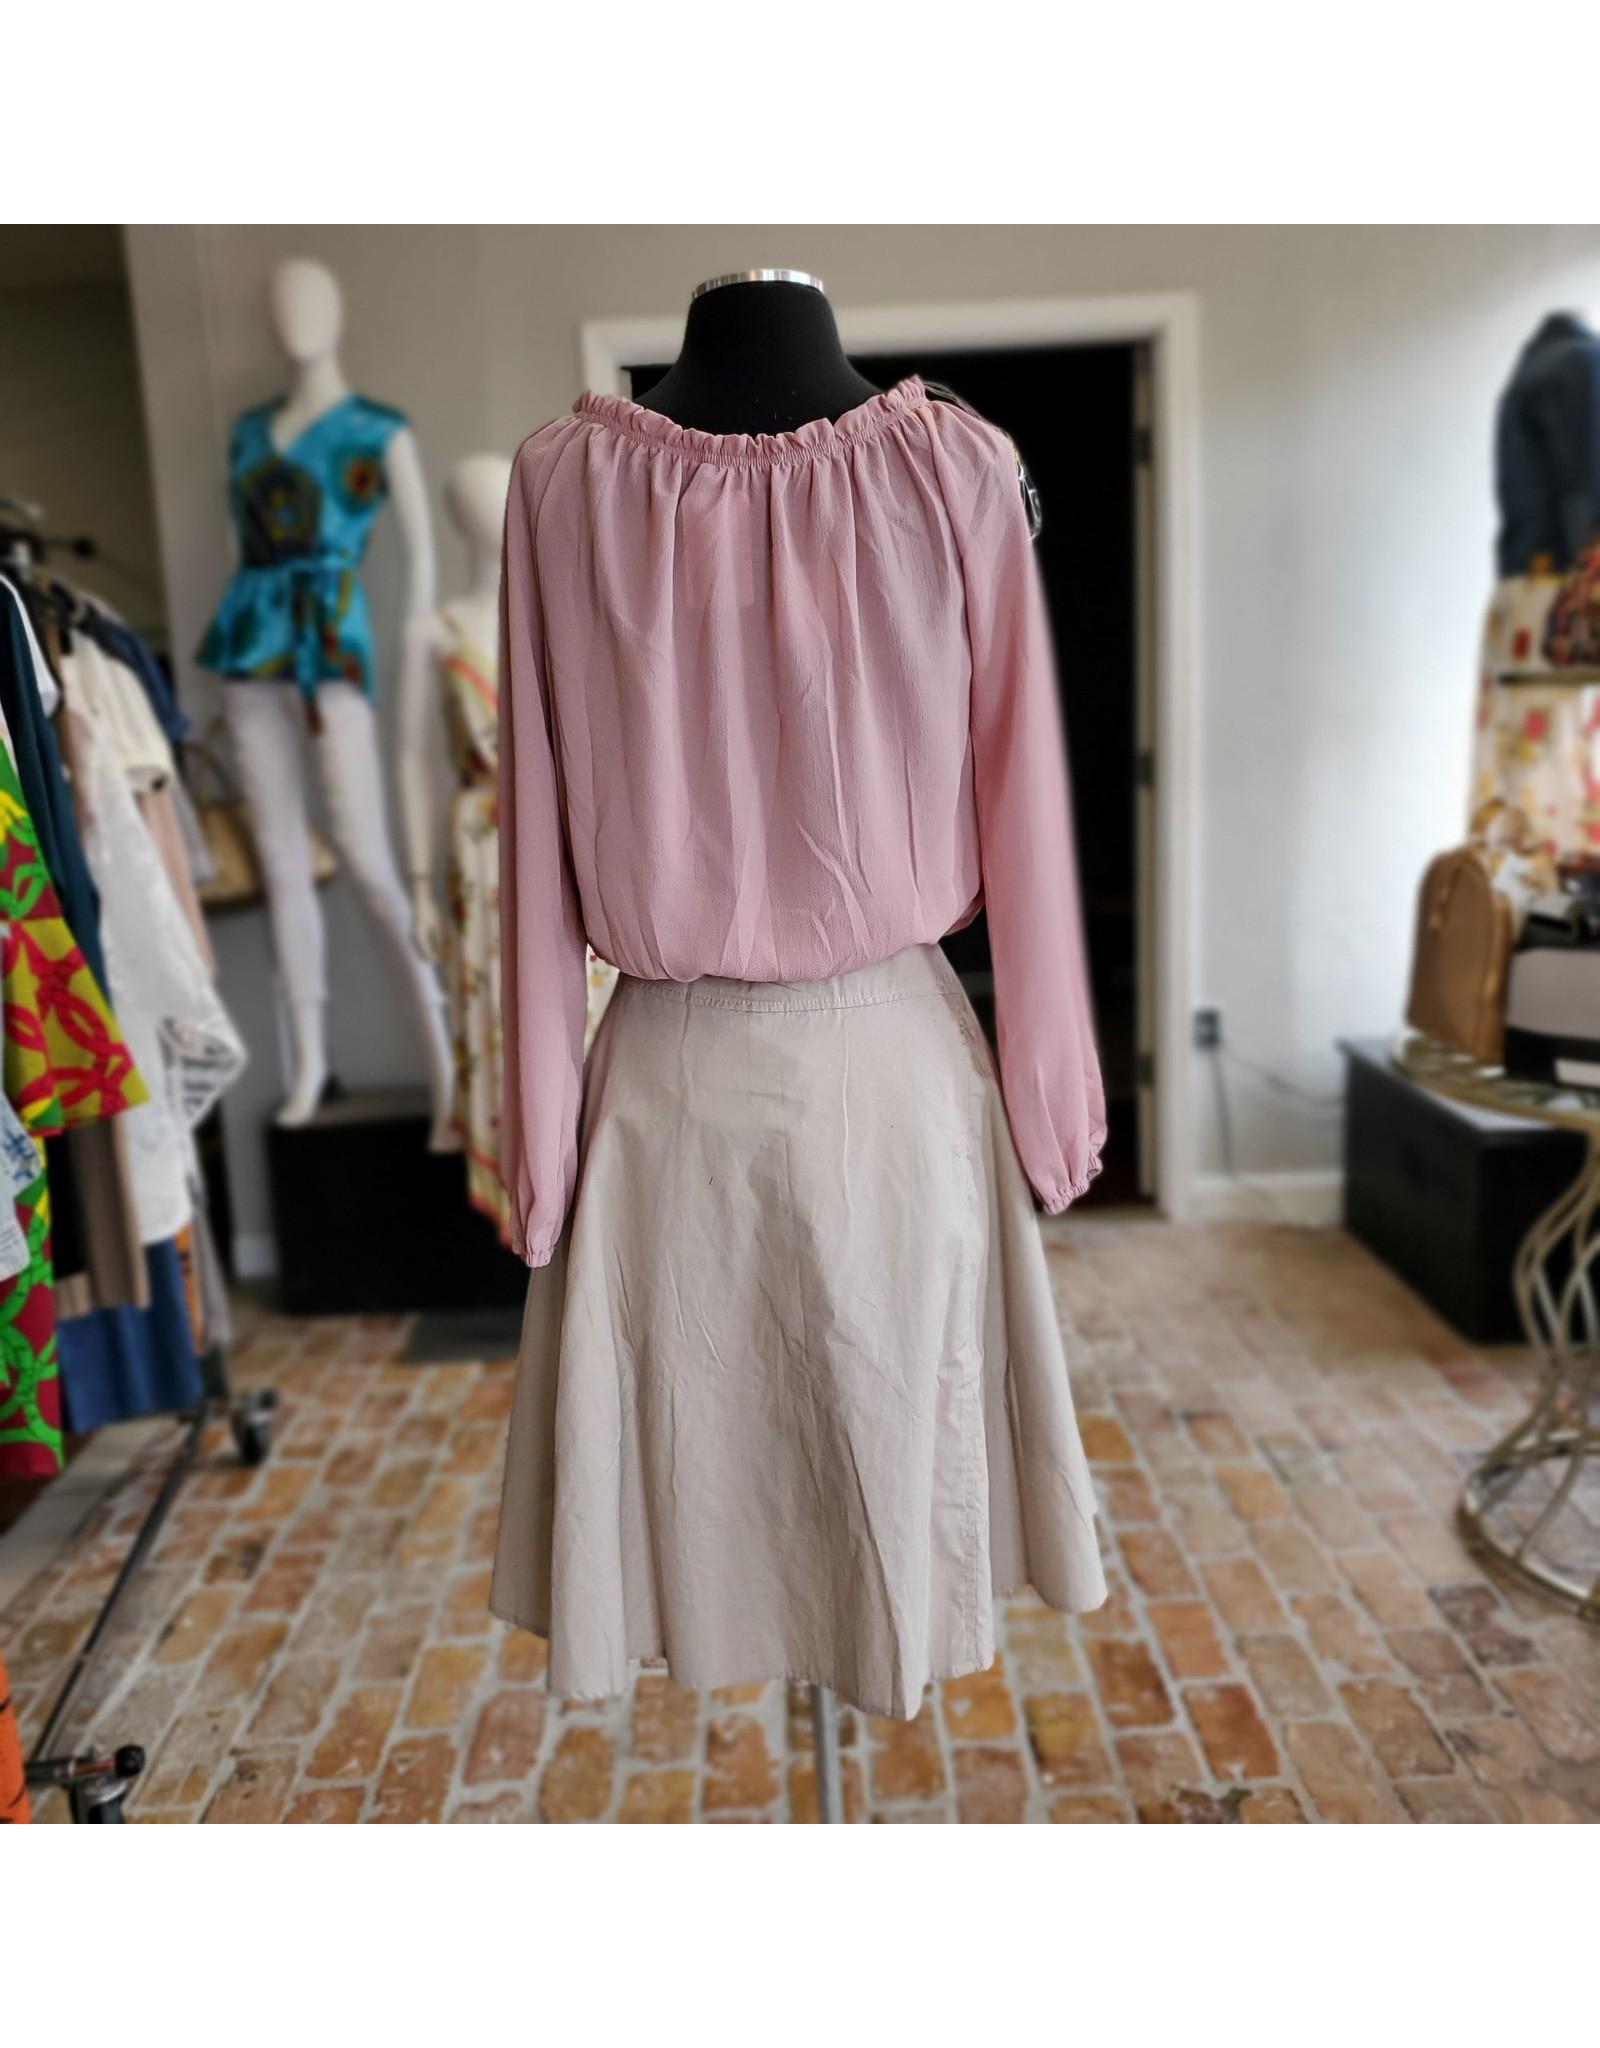 Khaki Beaded Skirt Medium